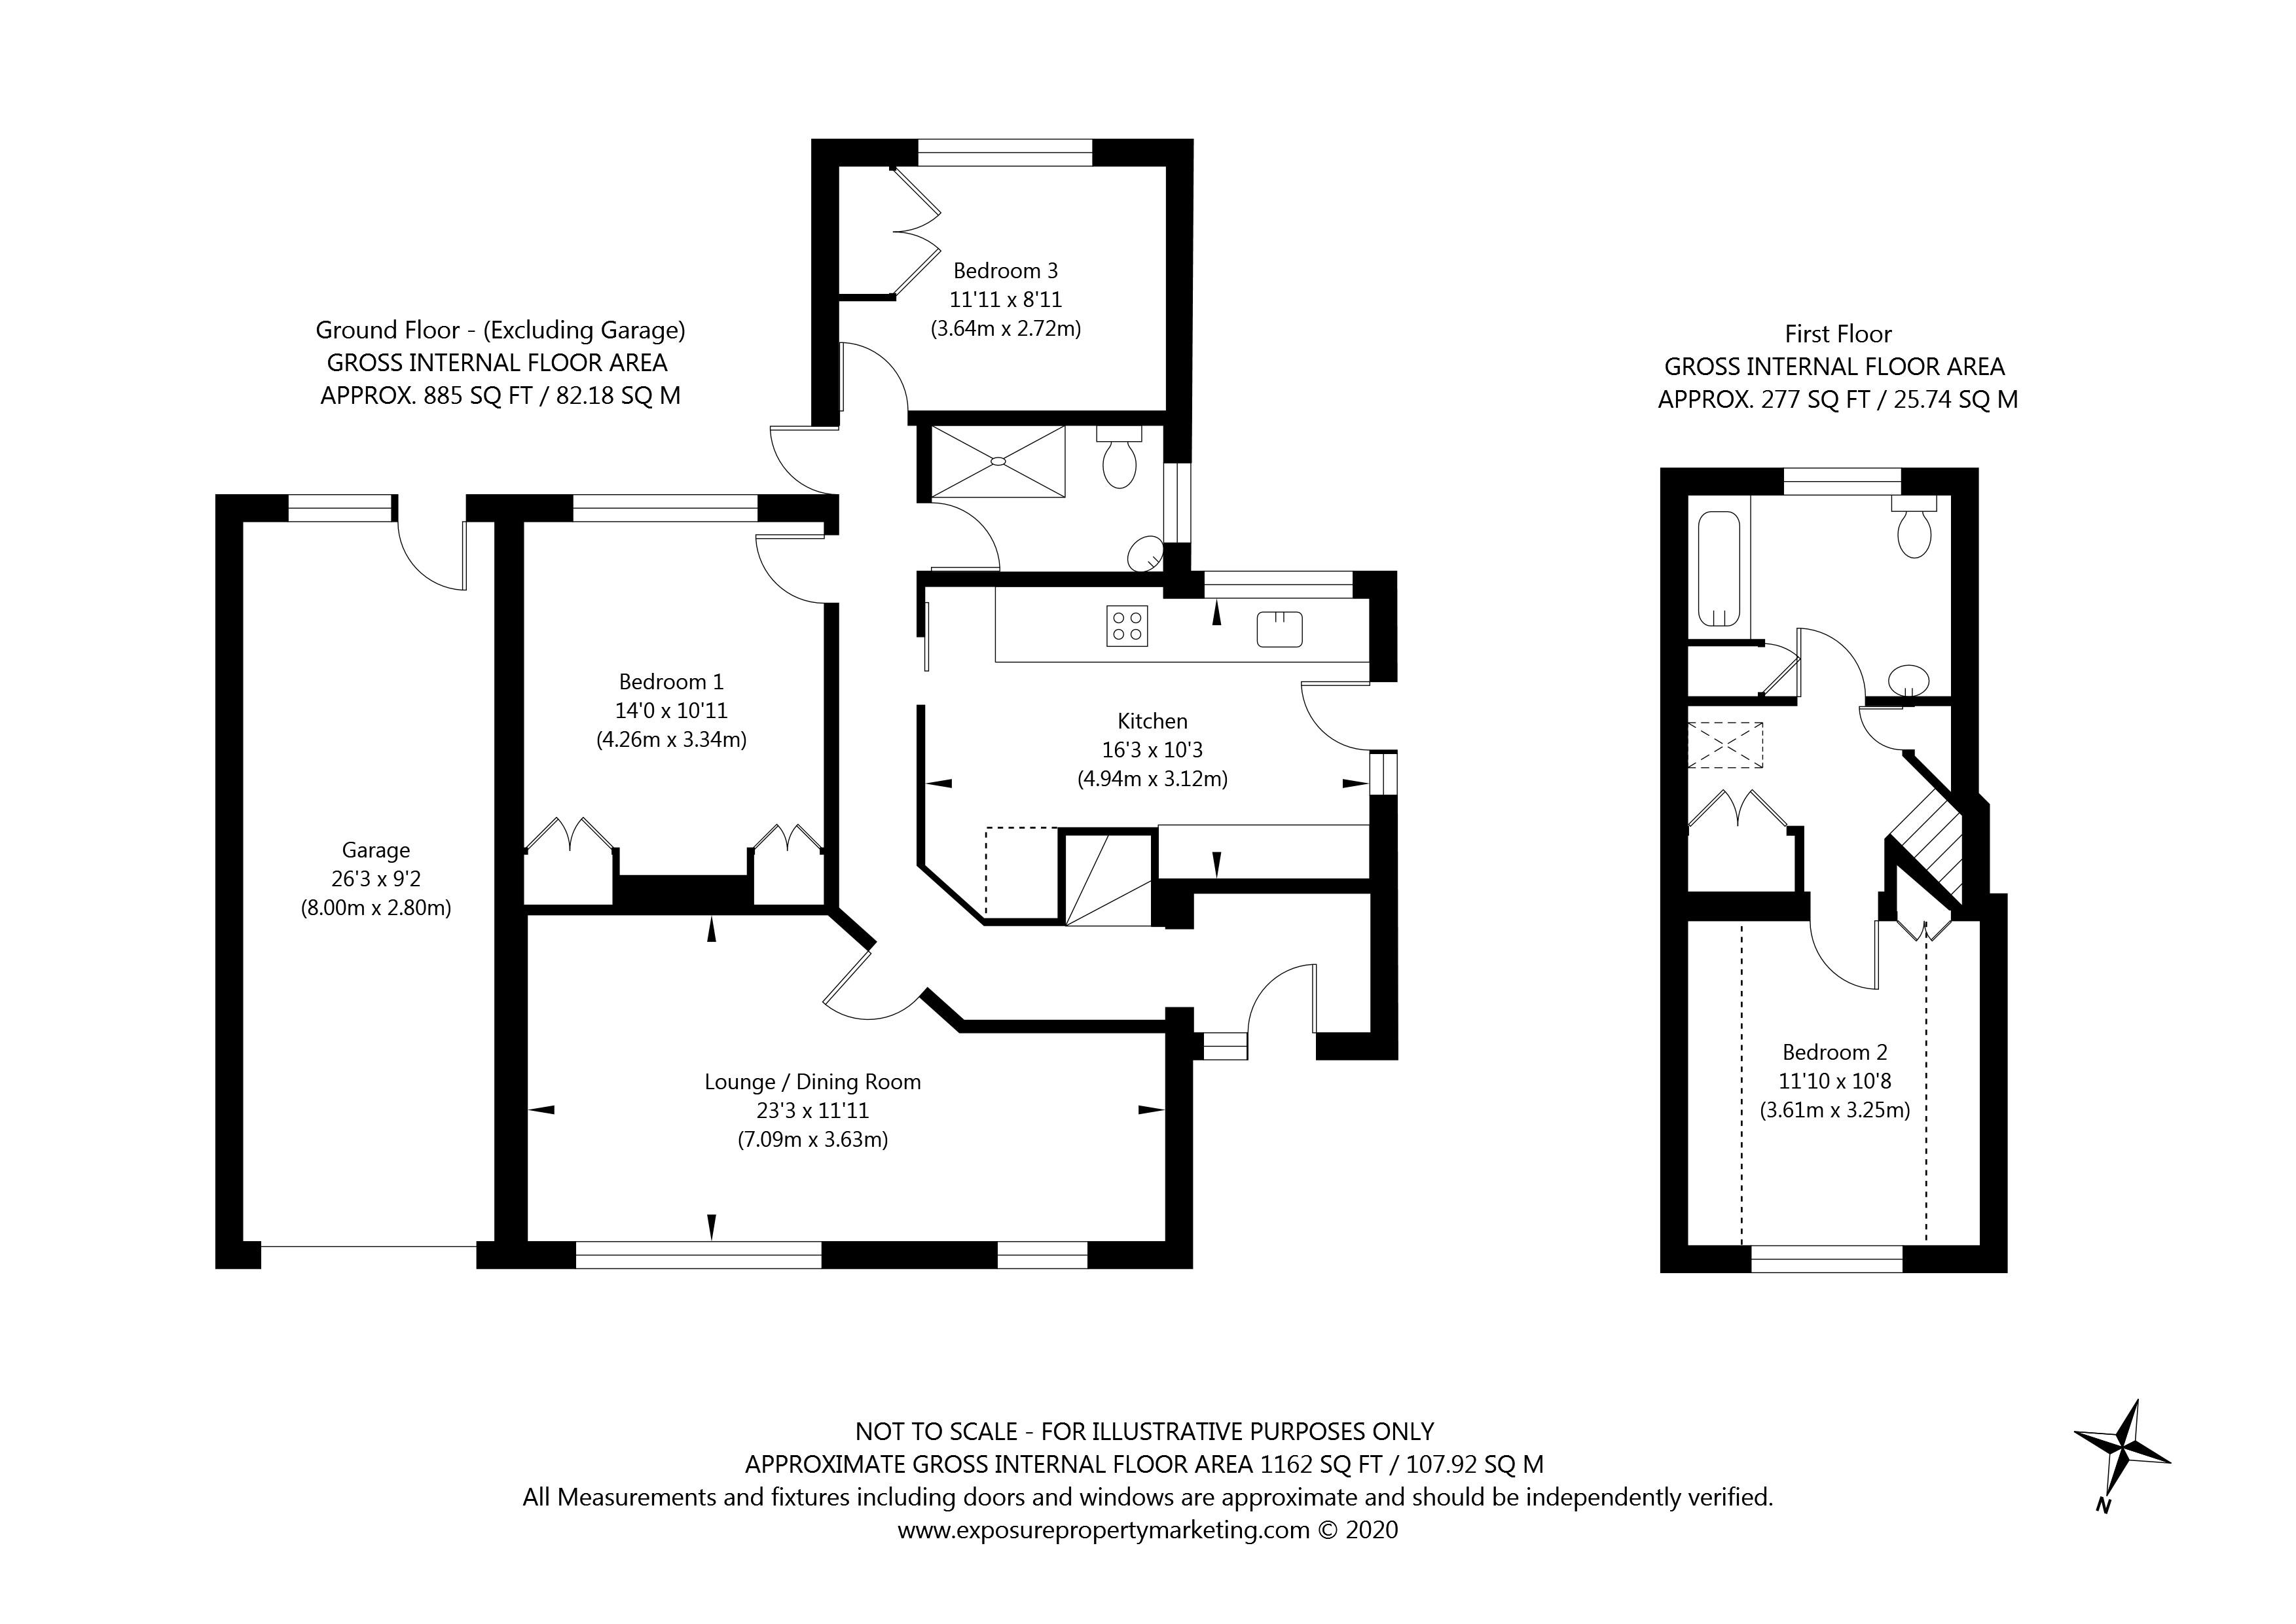 Beech Way, Upper Poppleton, York property floorplan